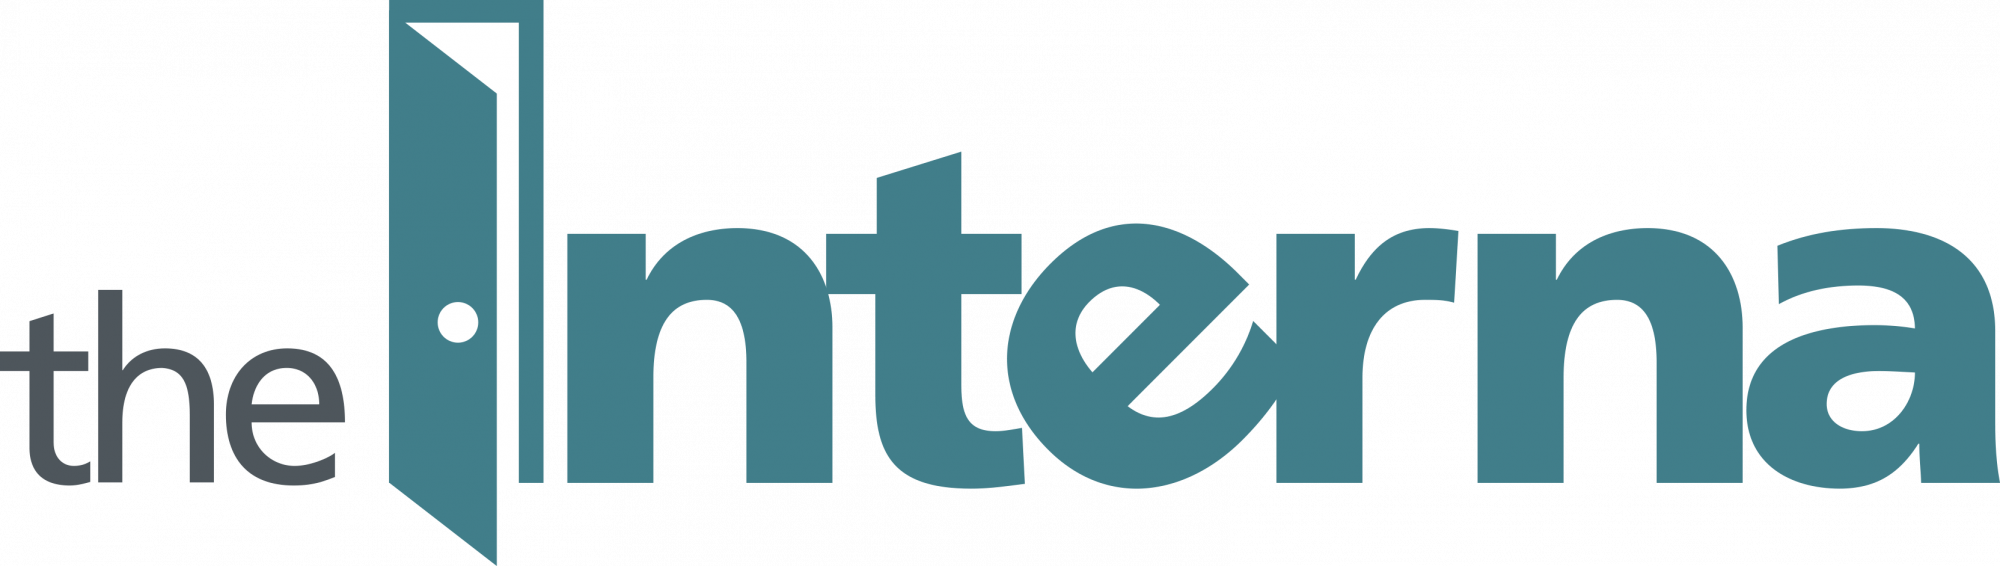 theInterna